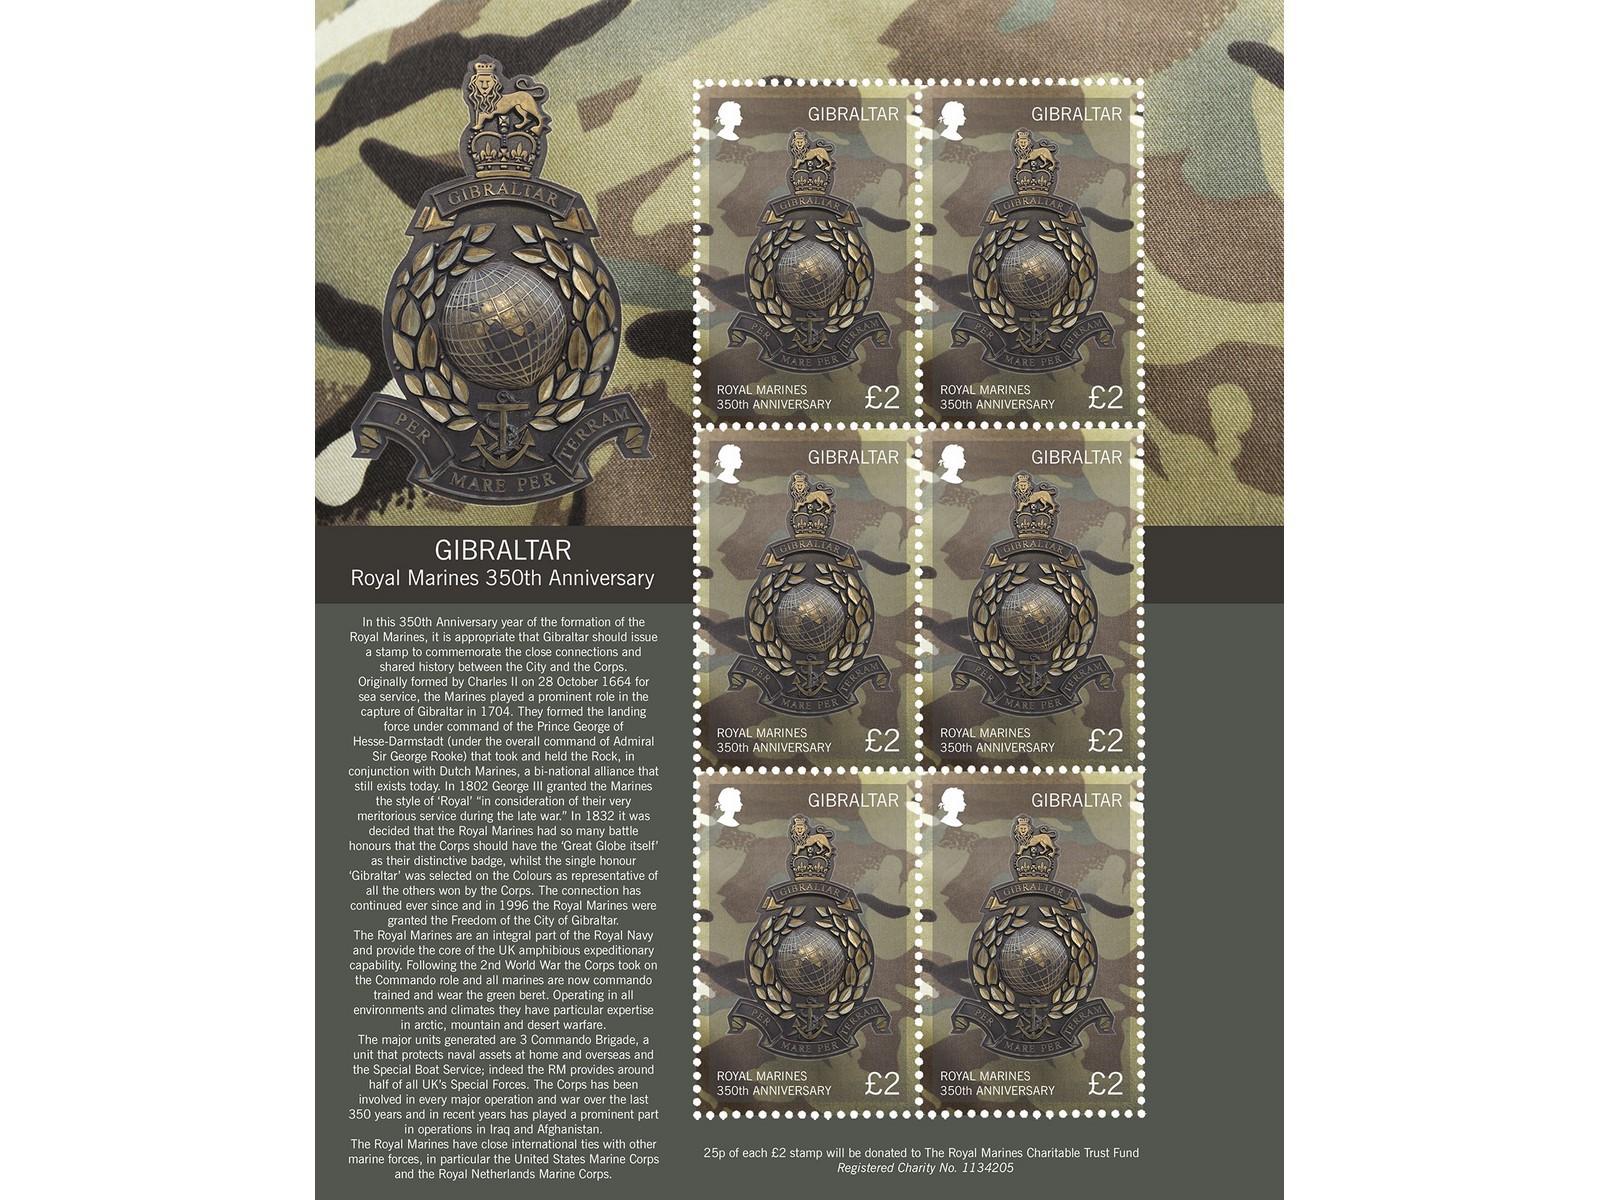 2014-Royal-Marines-350th-Anniversary